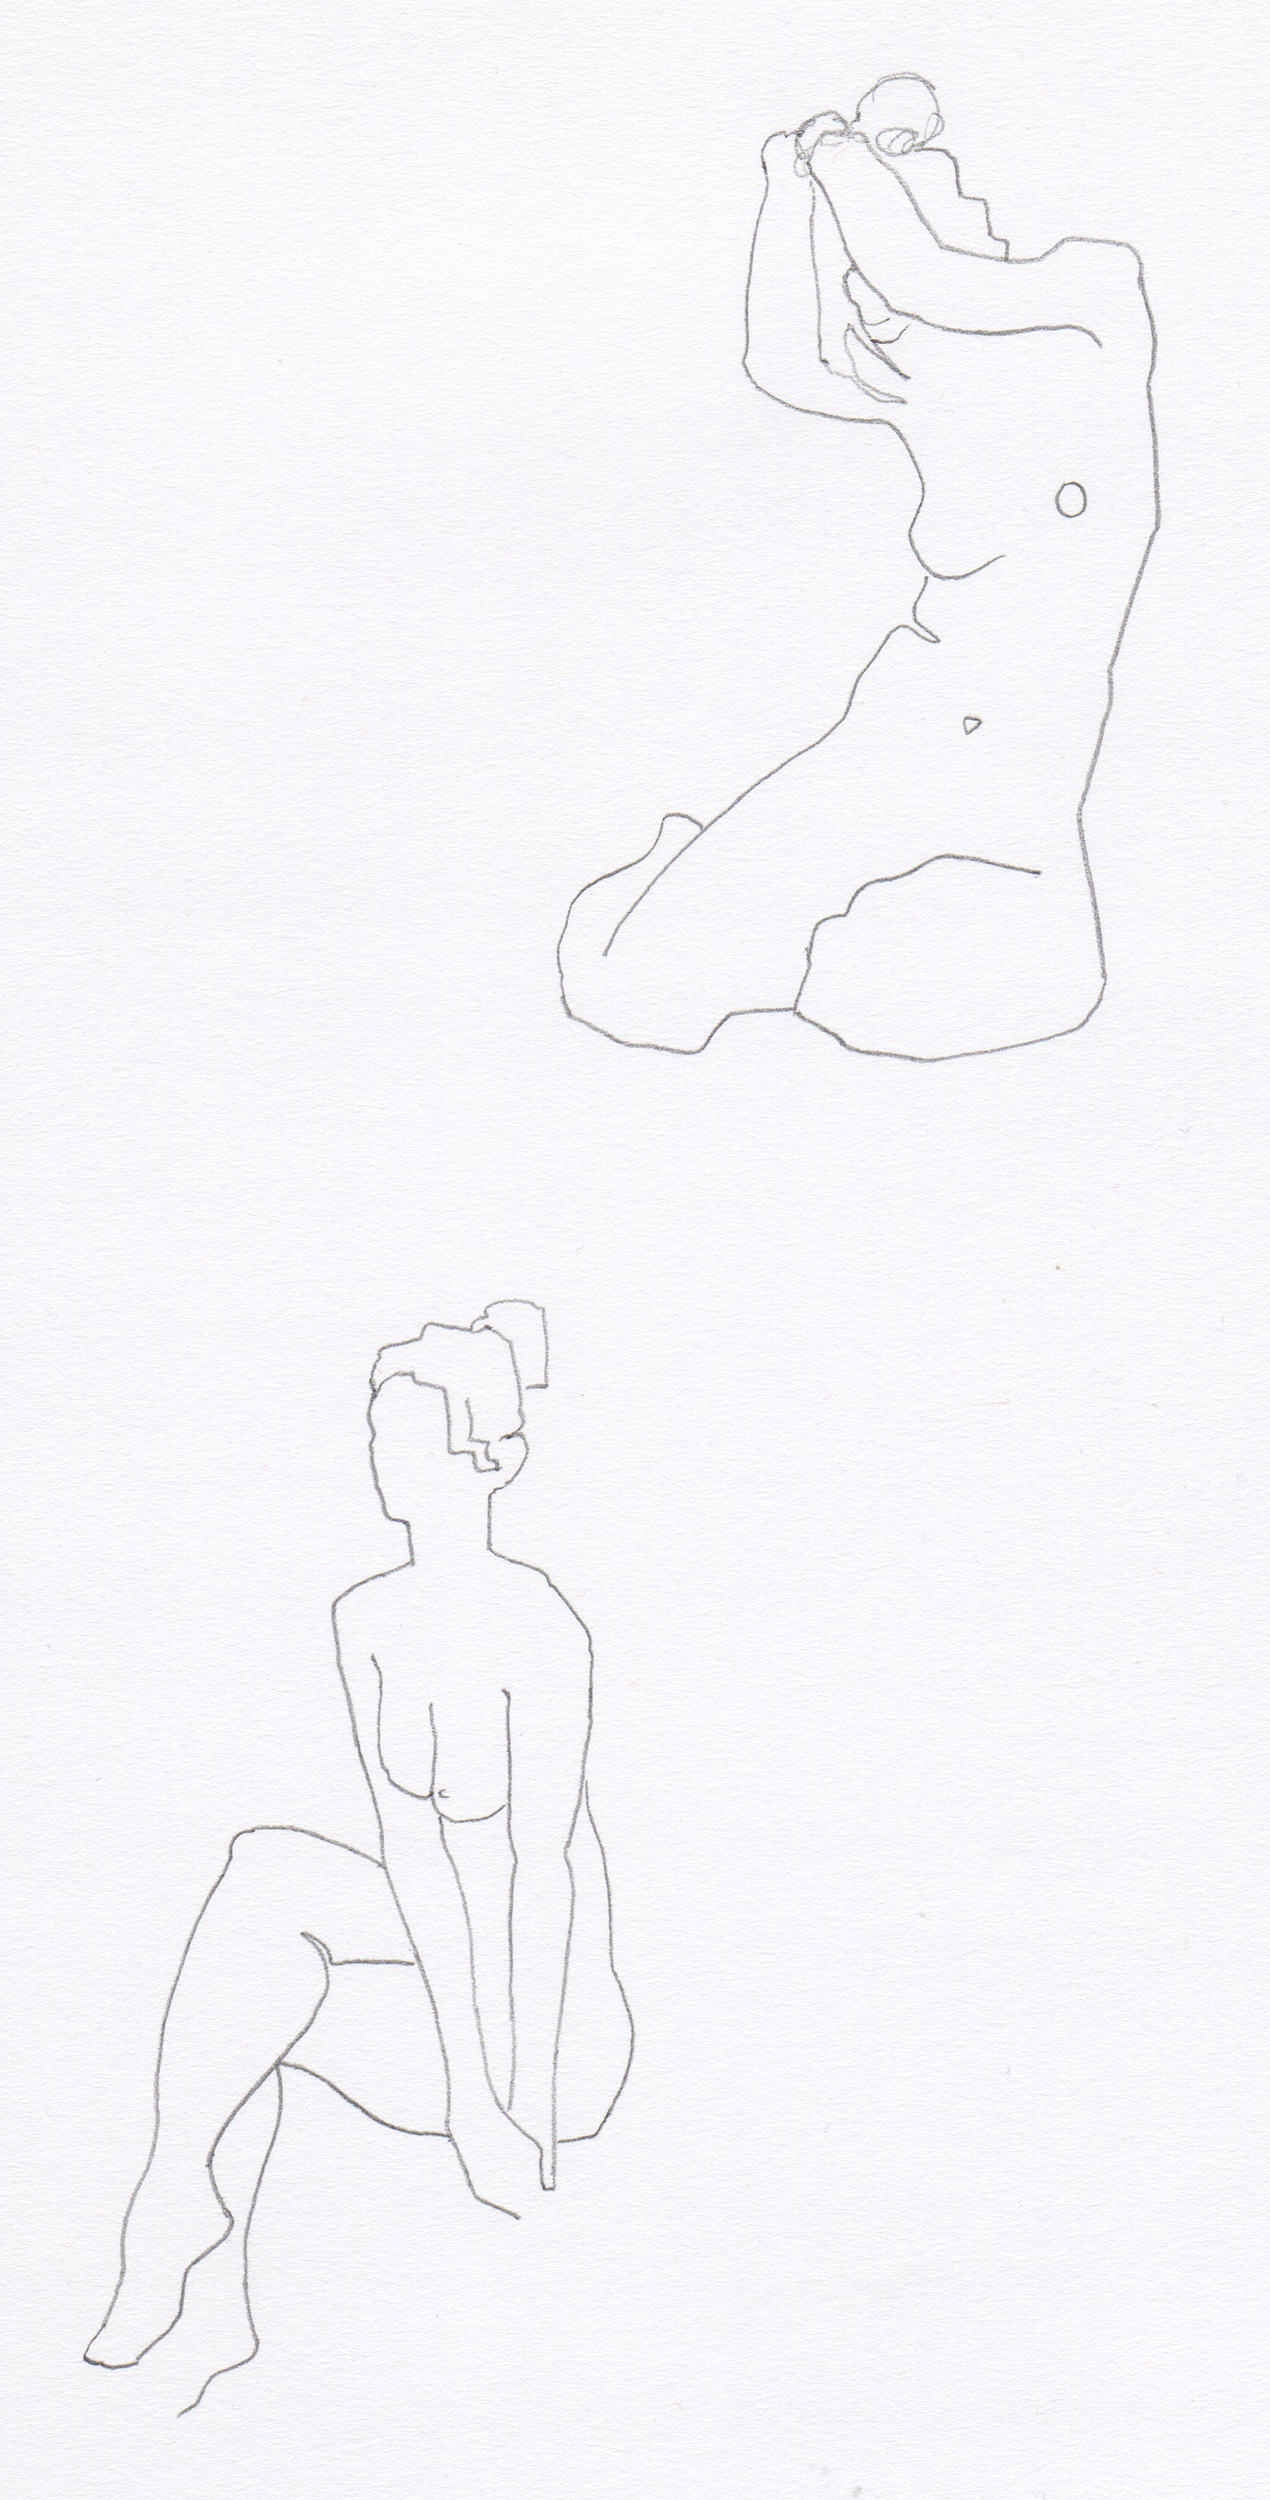 2012_Sketch_F-Beudin_014